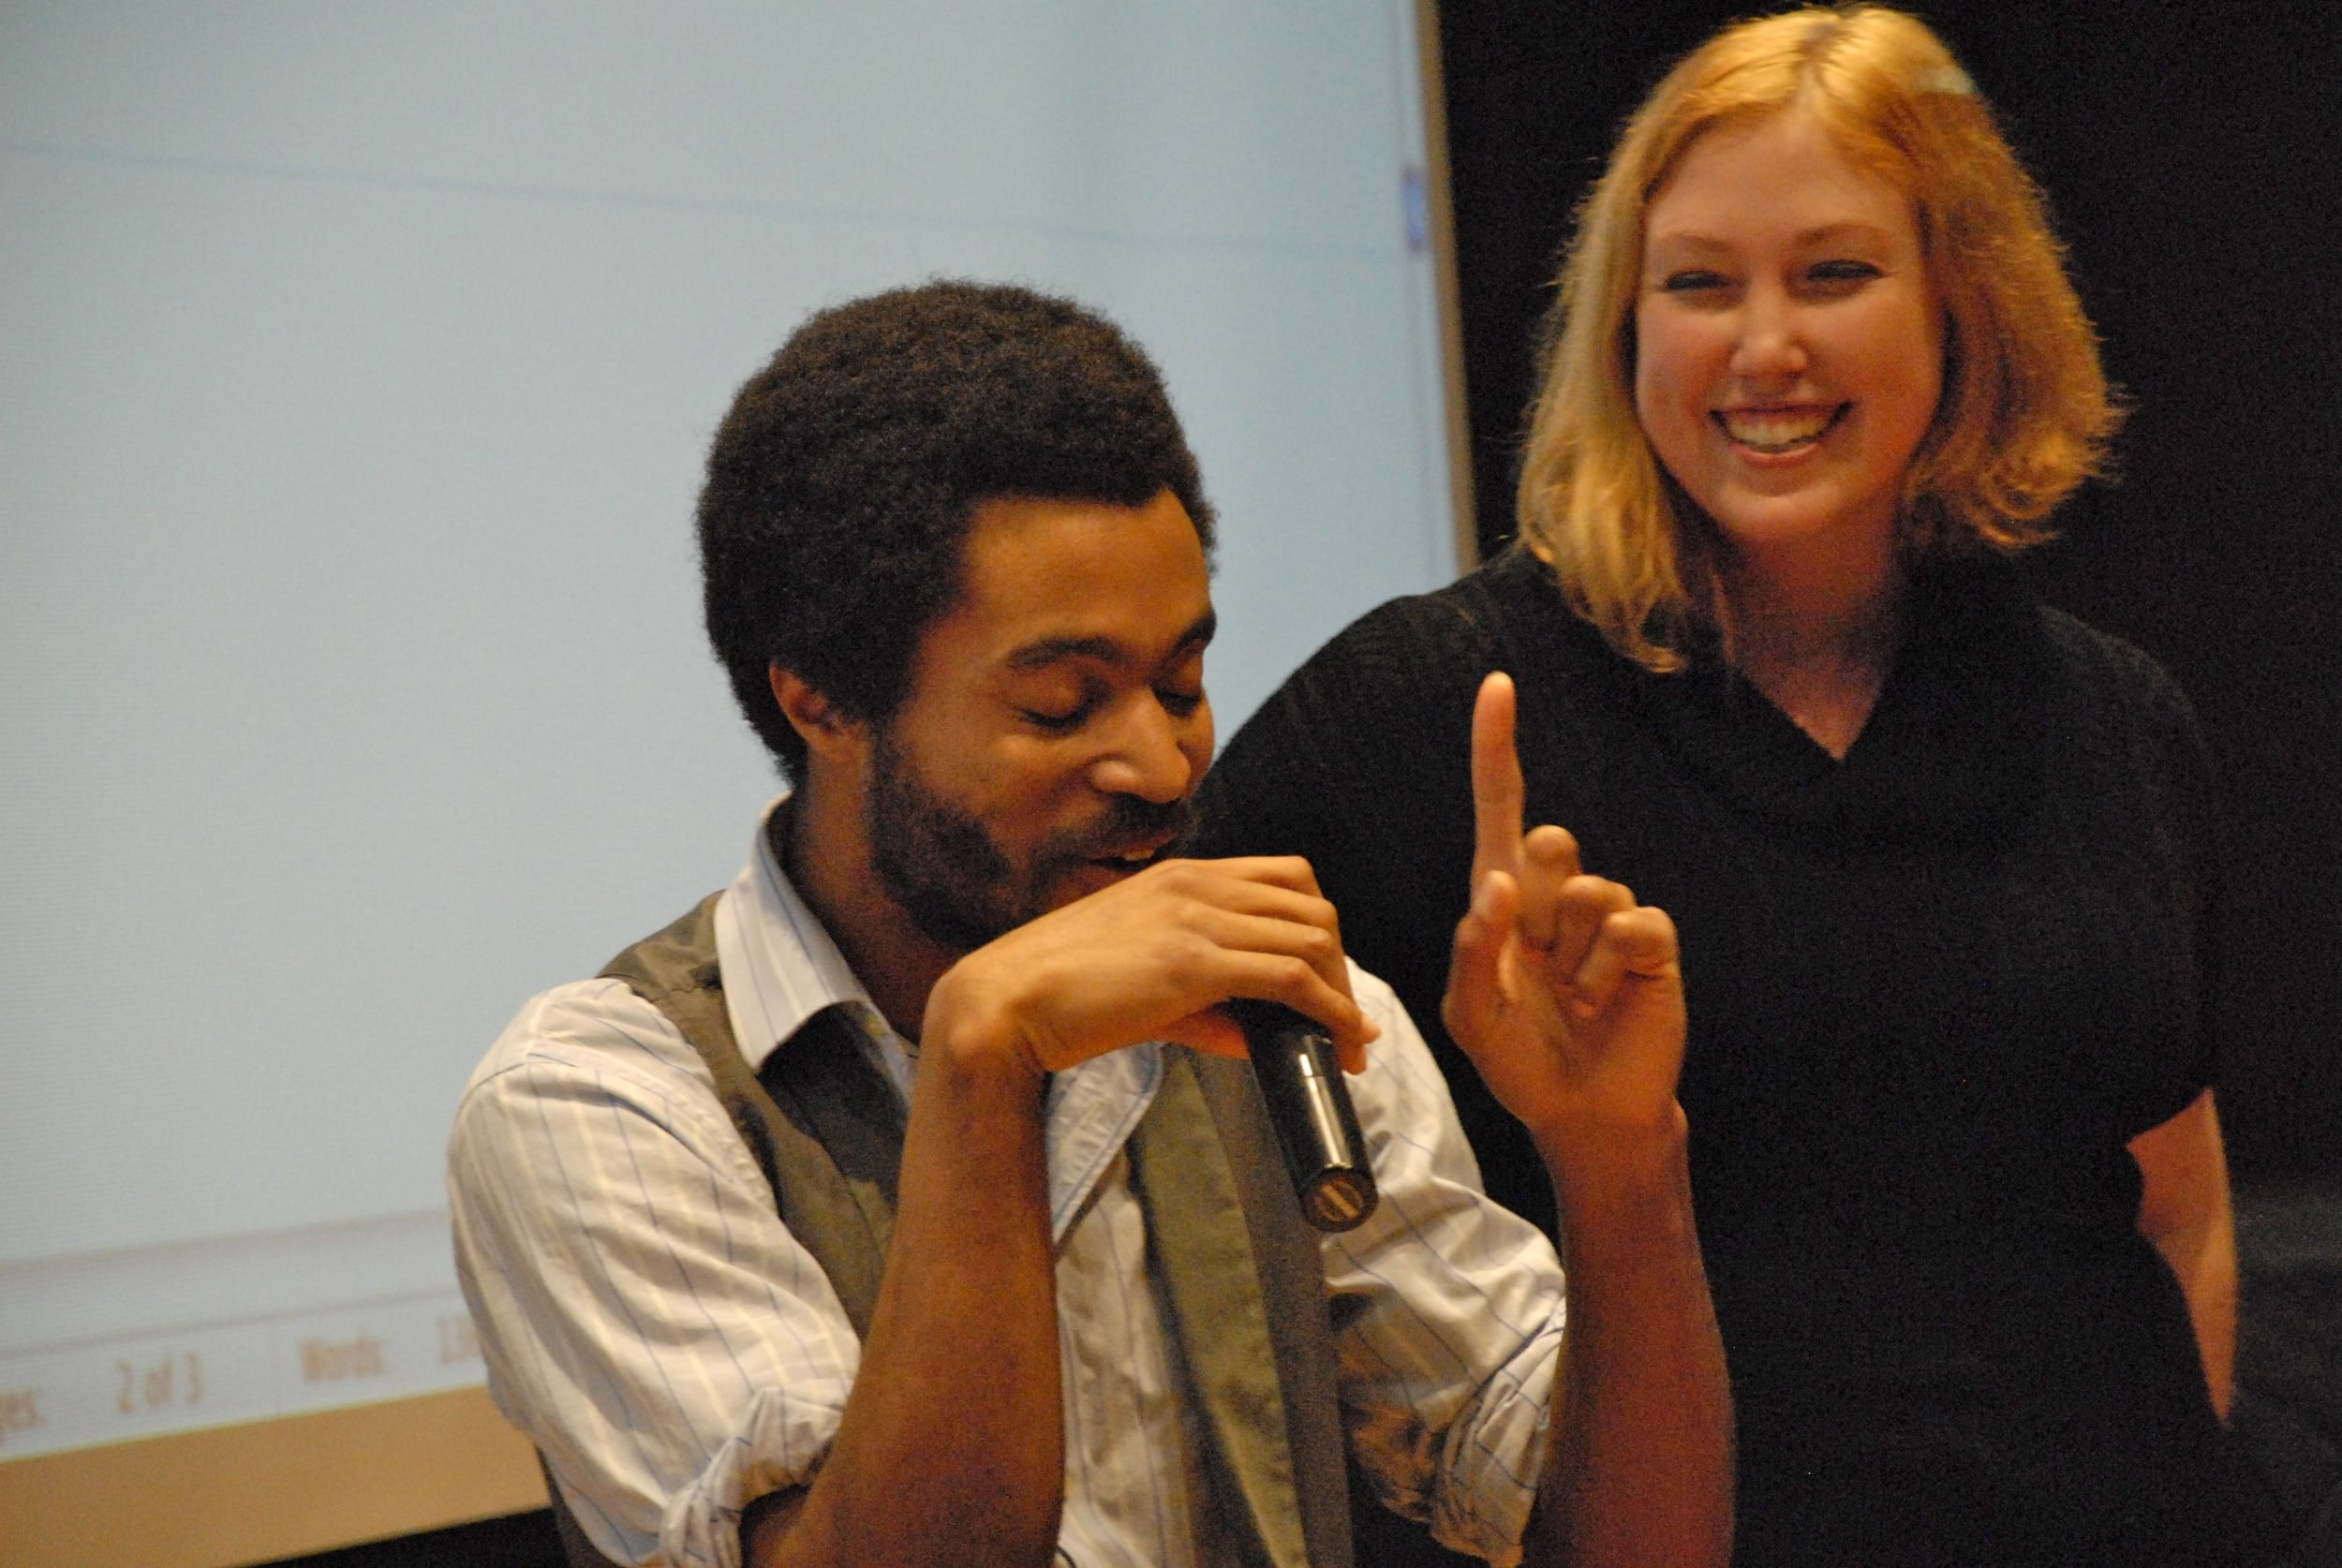 Poet/Editor Nic Hampton and Photographer/Art Director Brittany Bauman, November 9, 2011